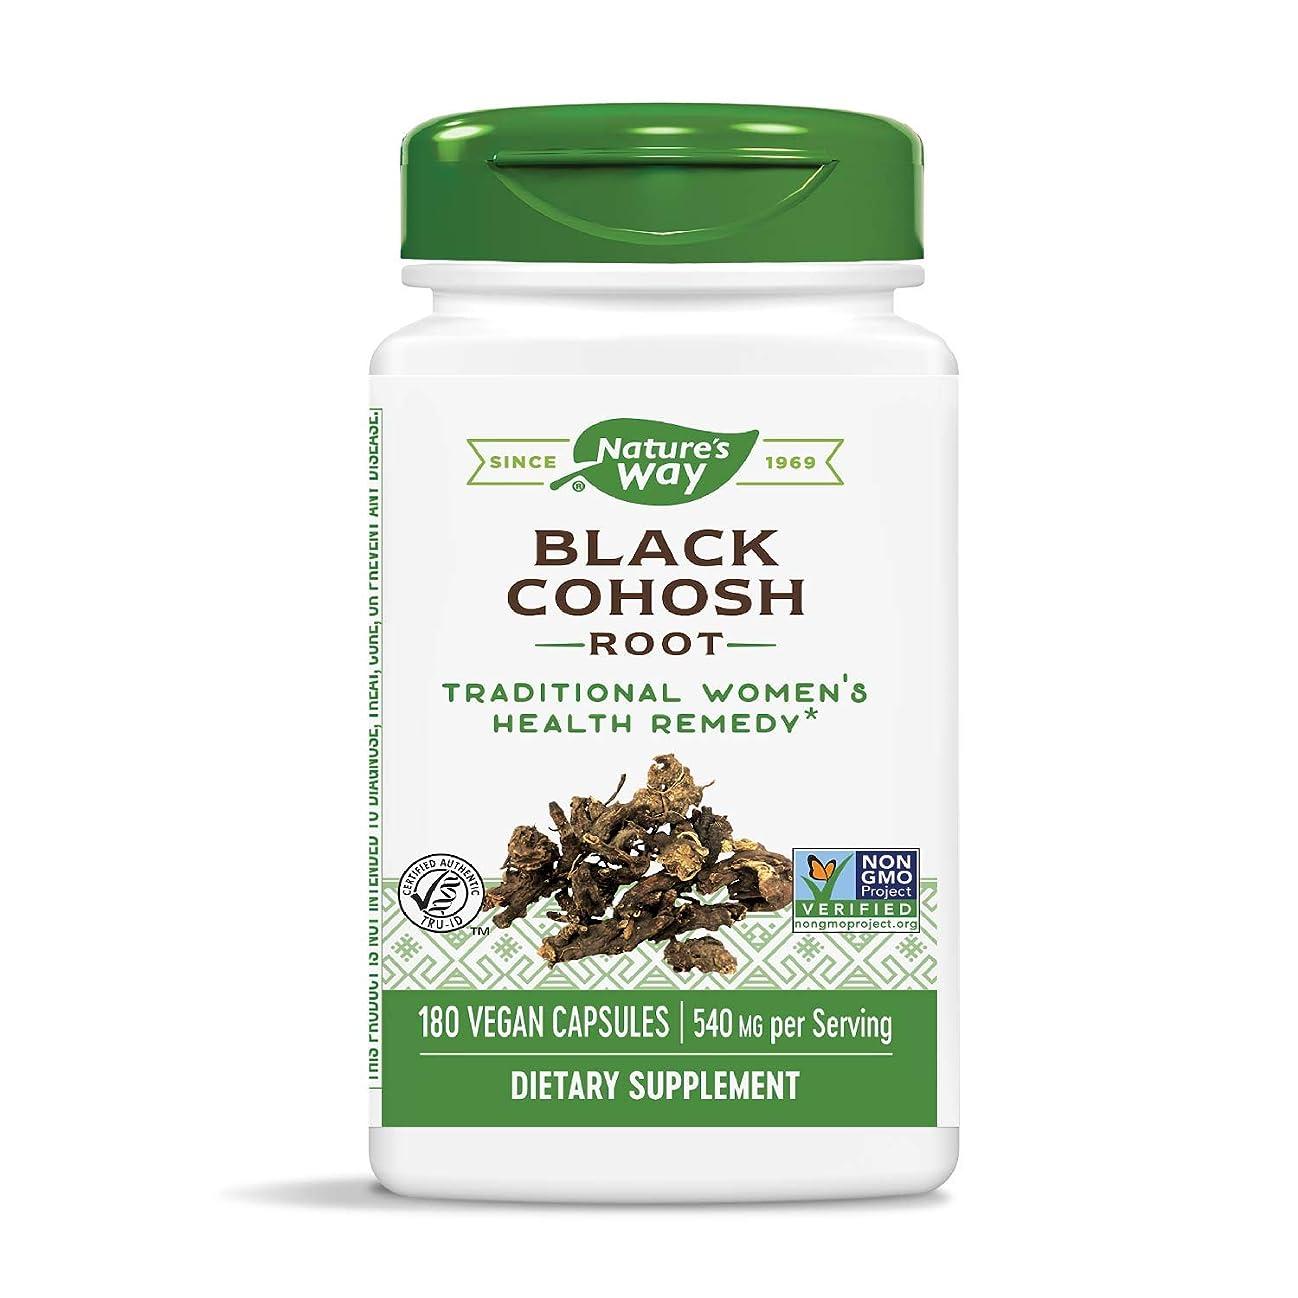 炎上役職感情海外直送品 Nature's Way Black Cohosh Root, 180 Caps